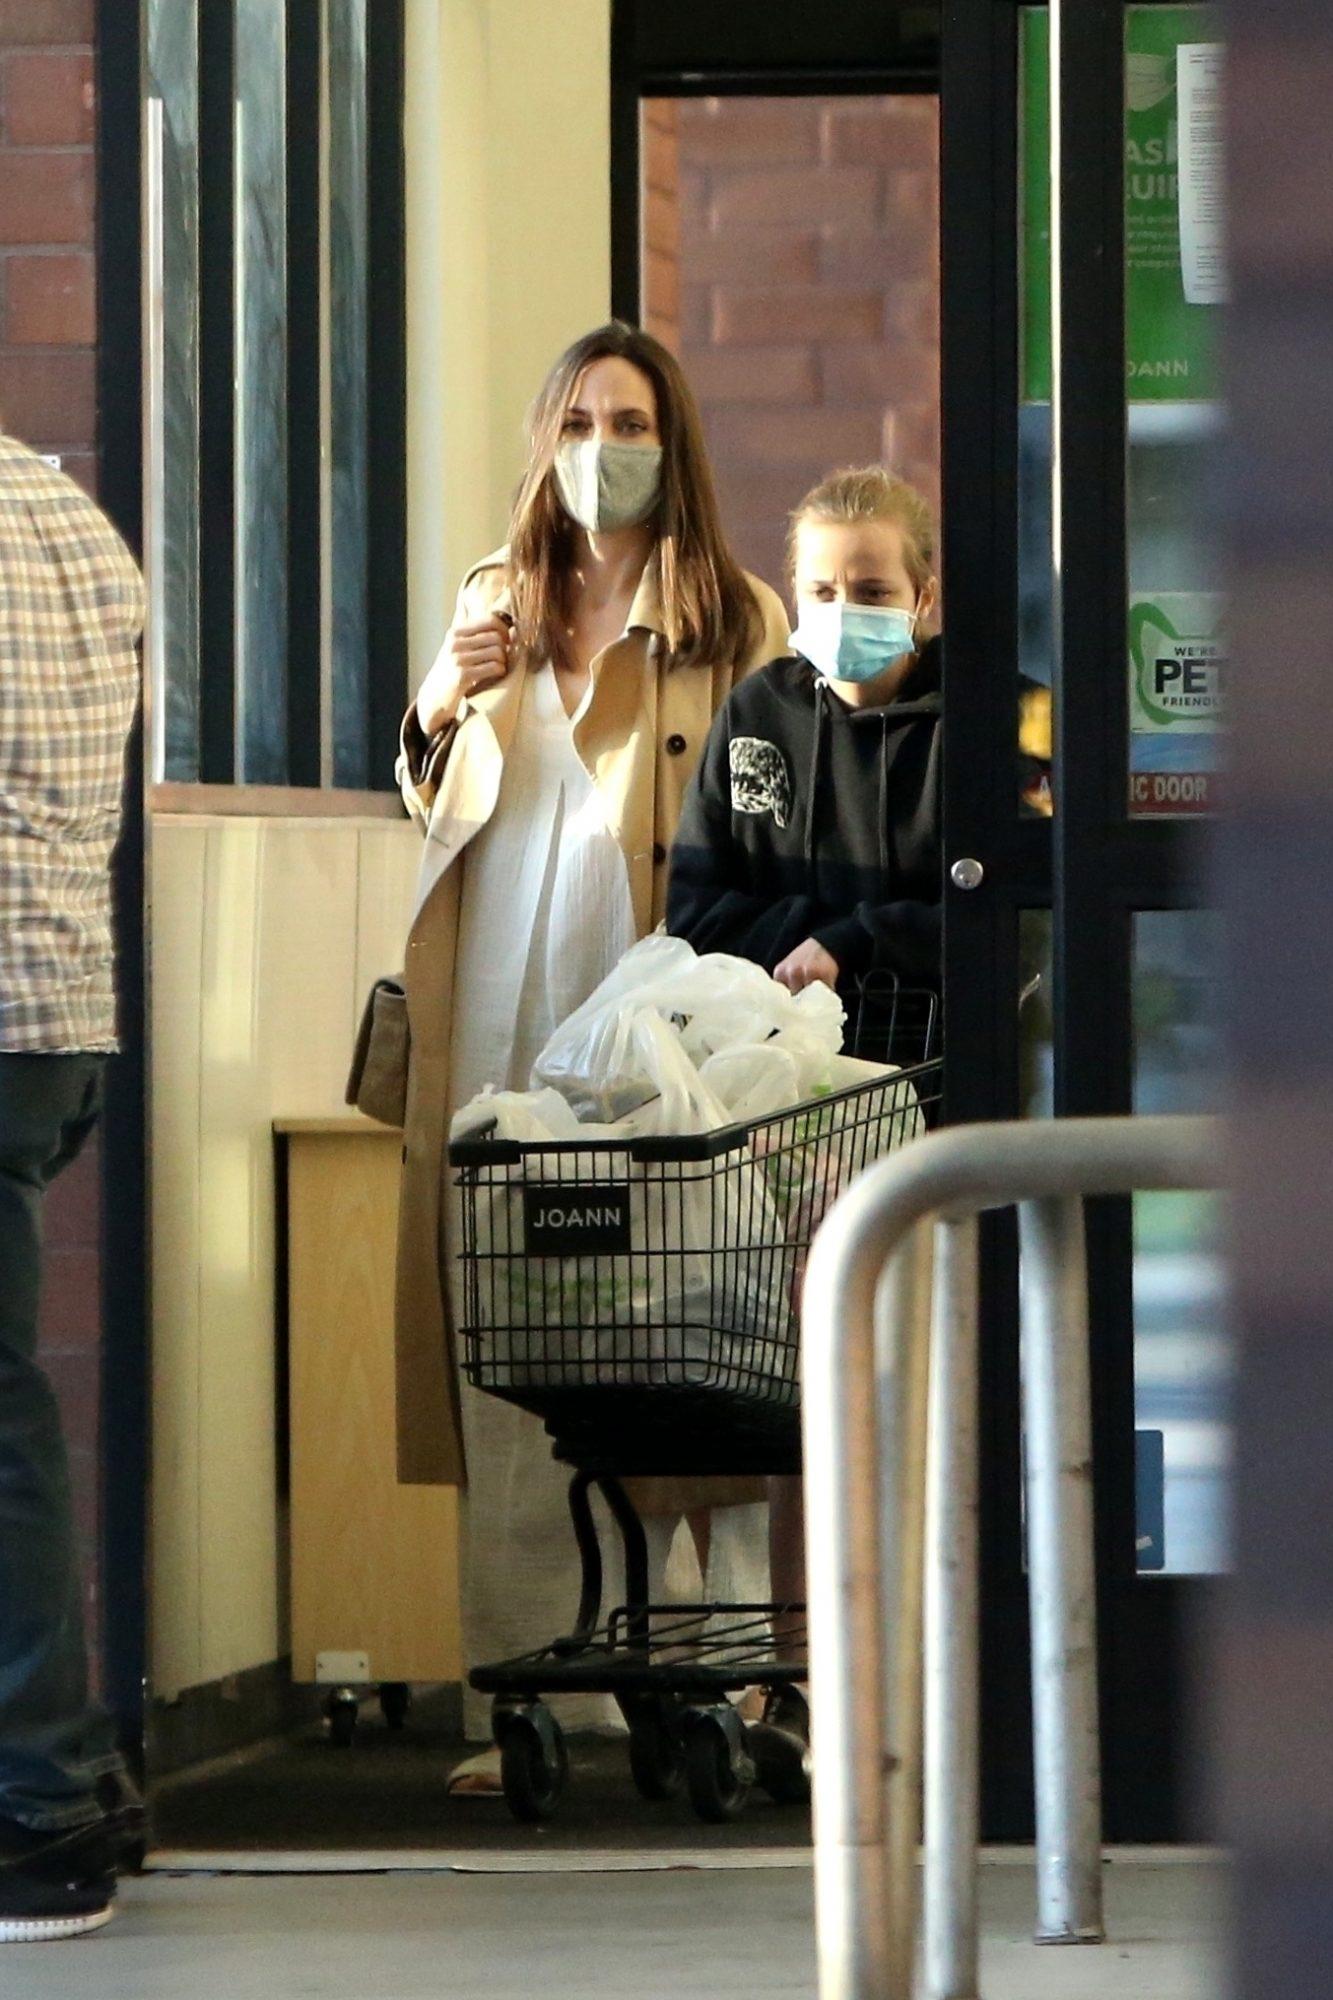 Angelina Jolie and Shiloh Pick Up Supplies at JOANN Fabrics